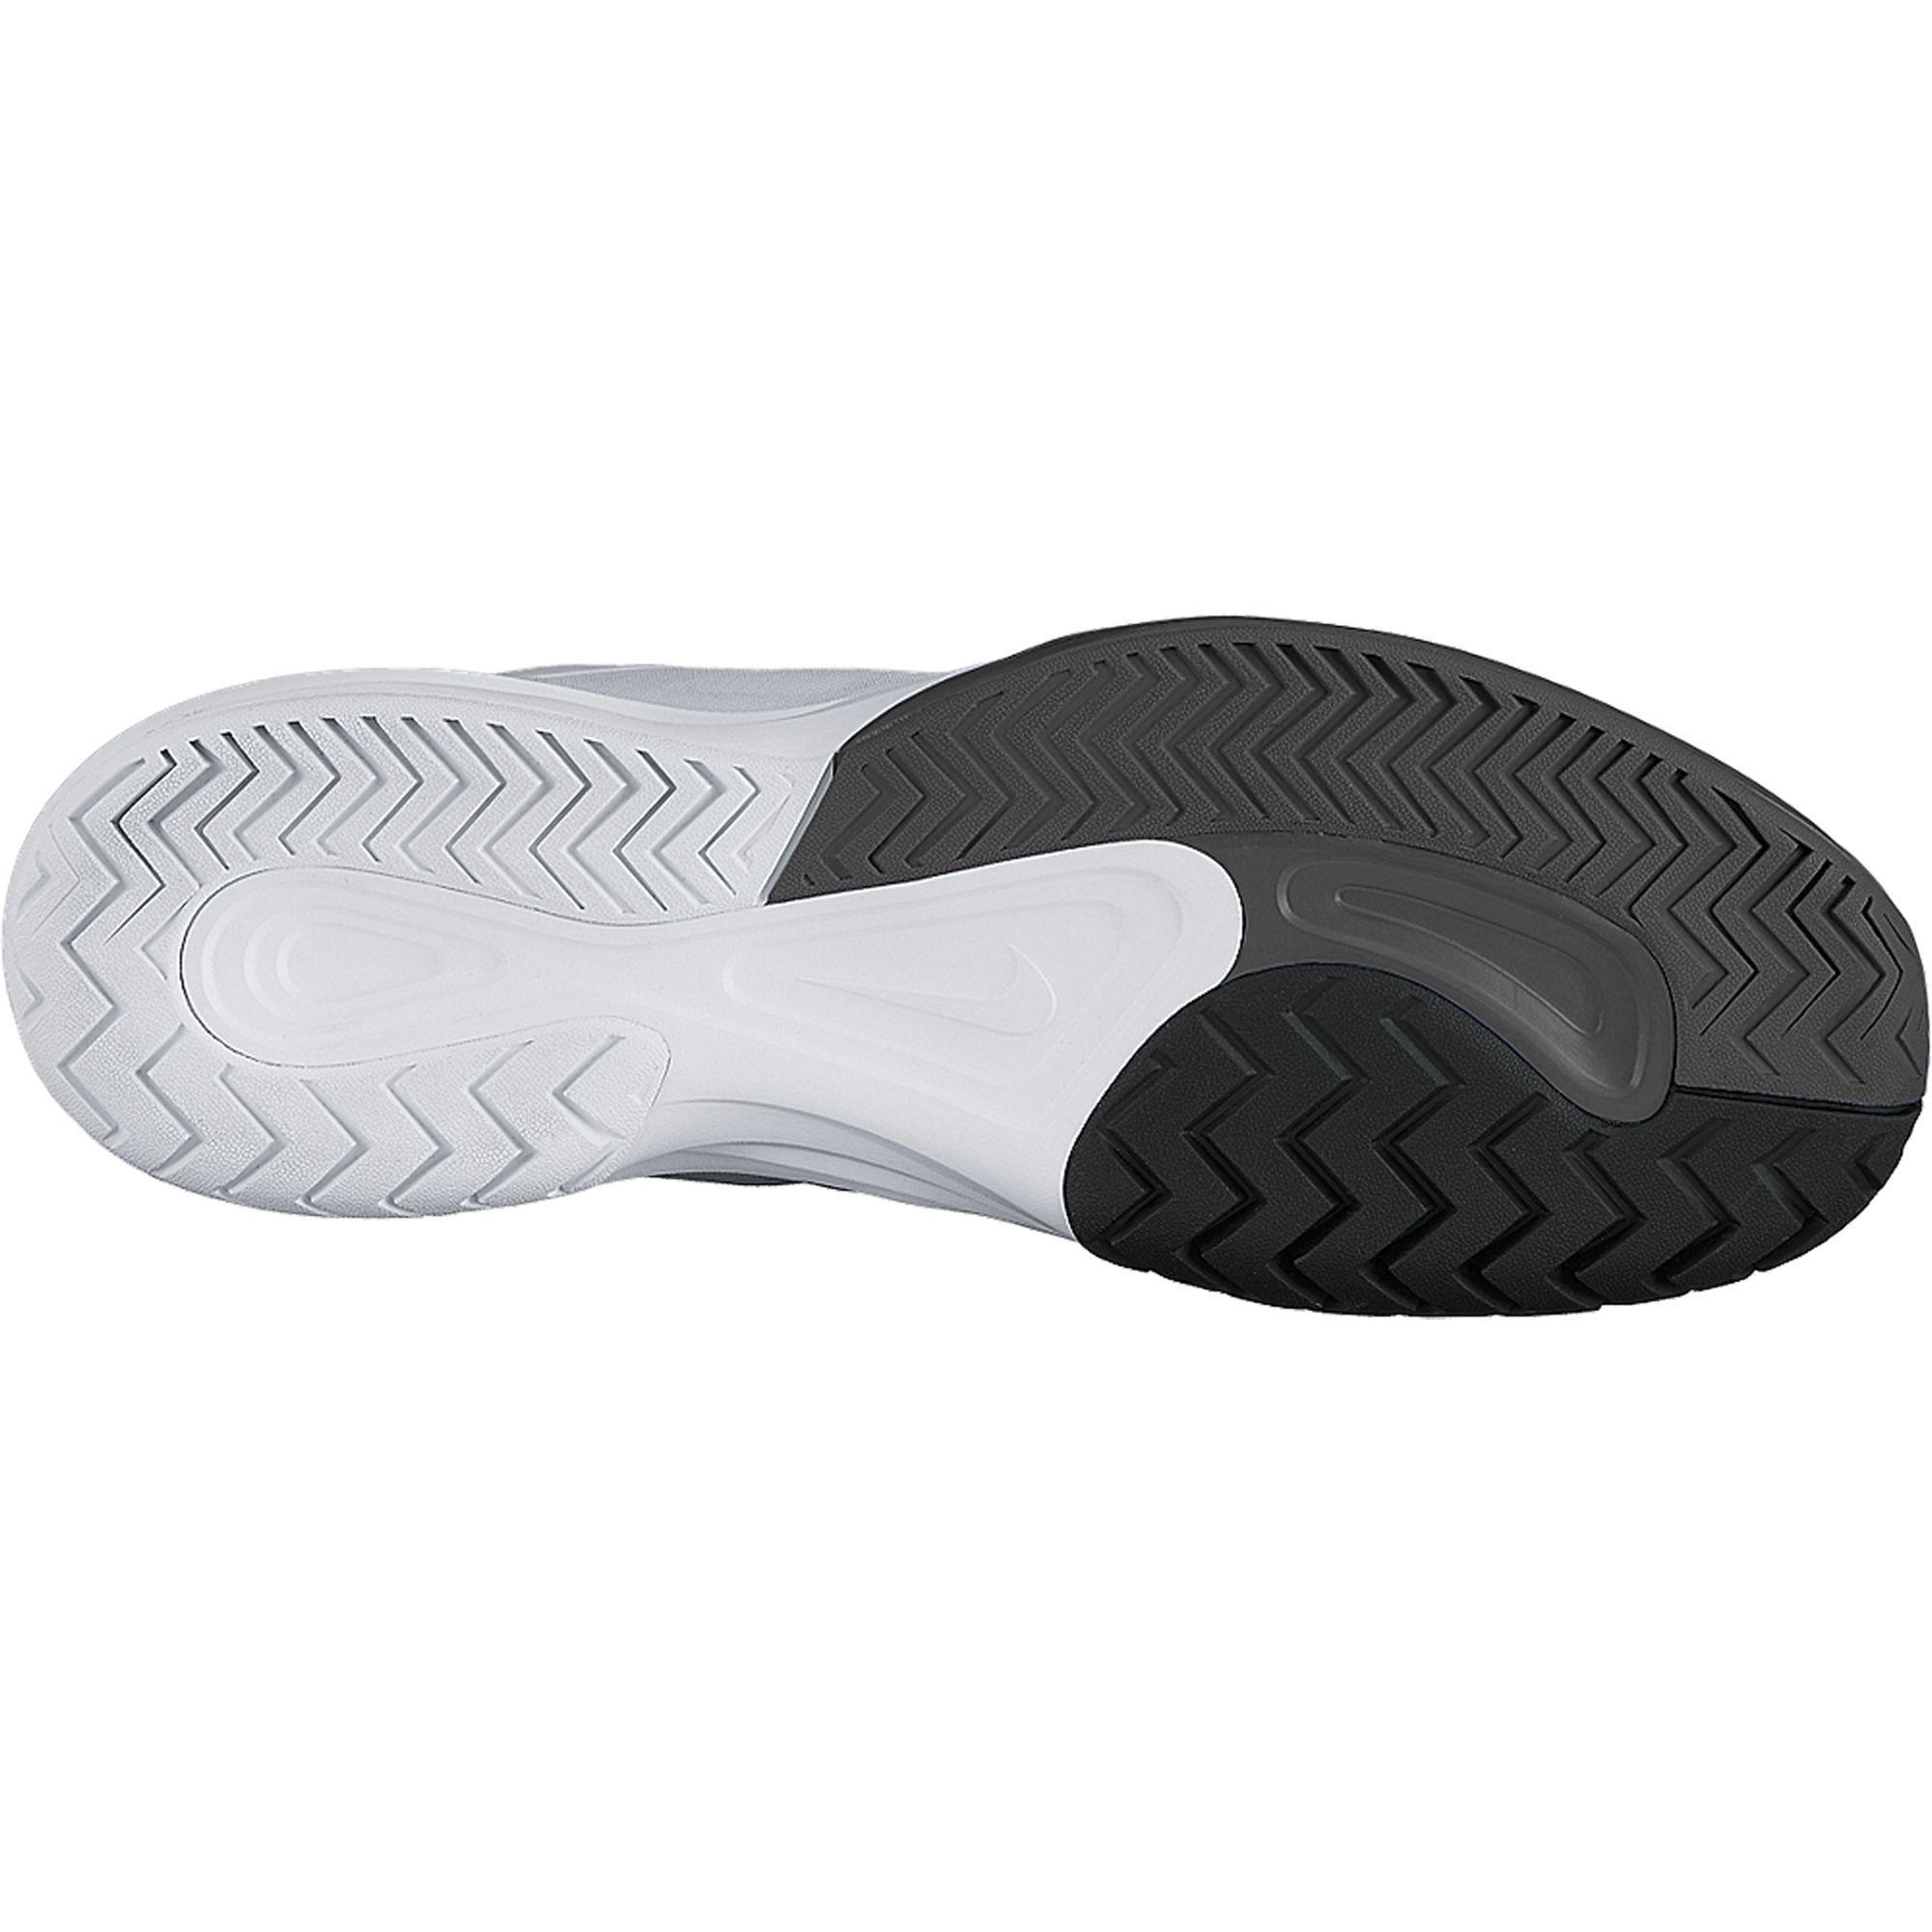 Nike Mens Dual Fusion Ballistec Advantage Tennis Shoes - White Medium Ash  Black 0c567e0b12